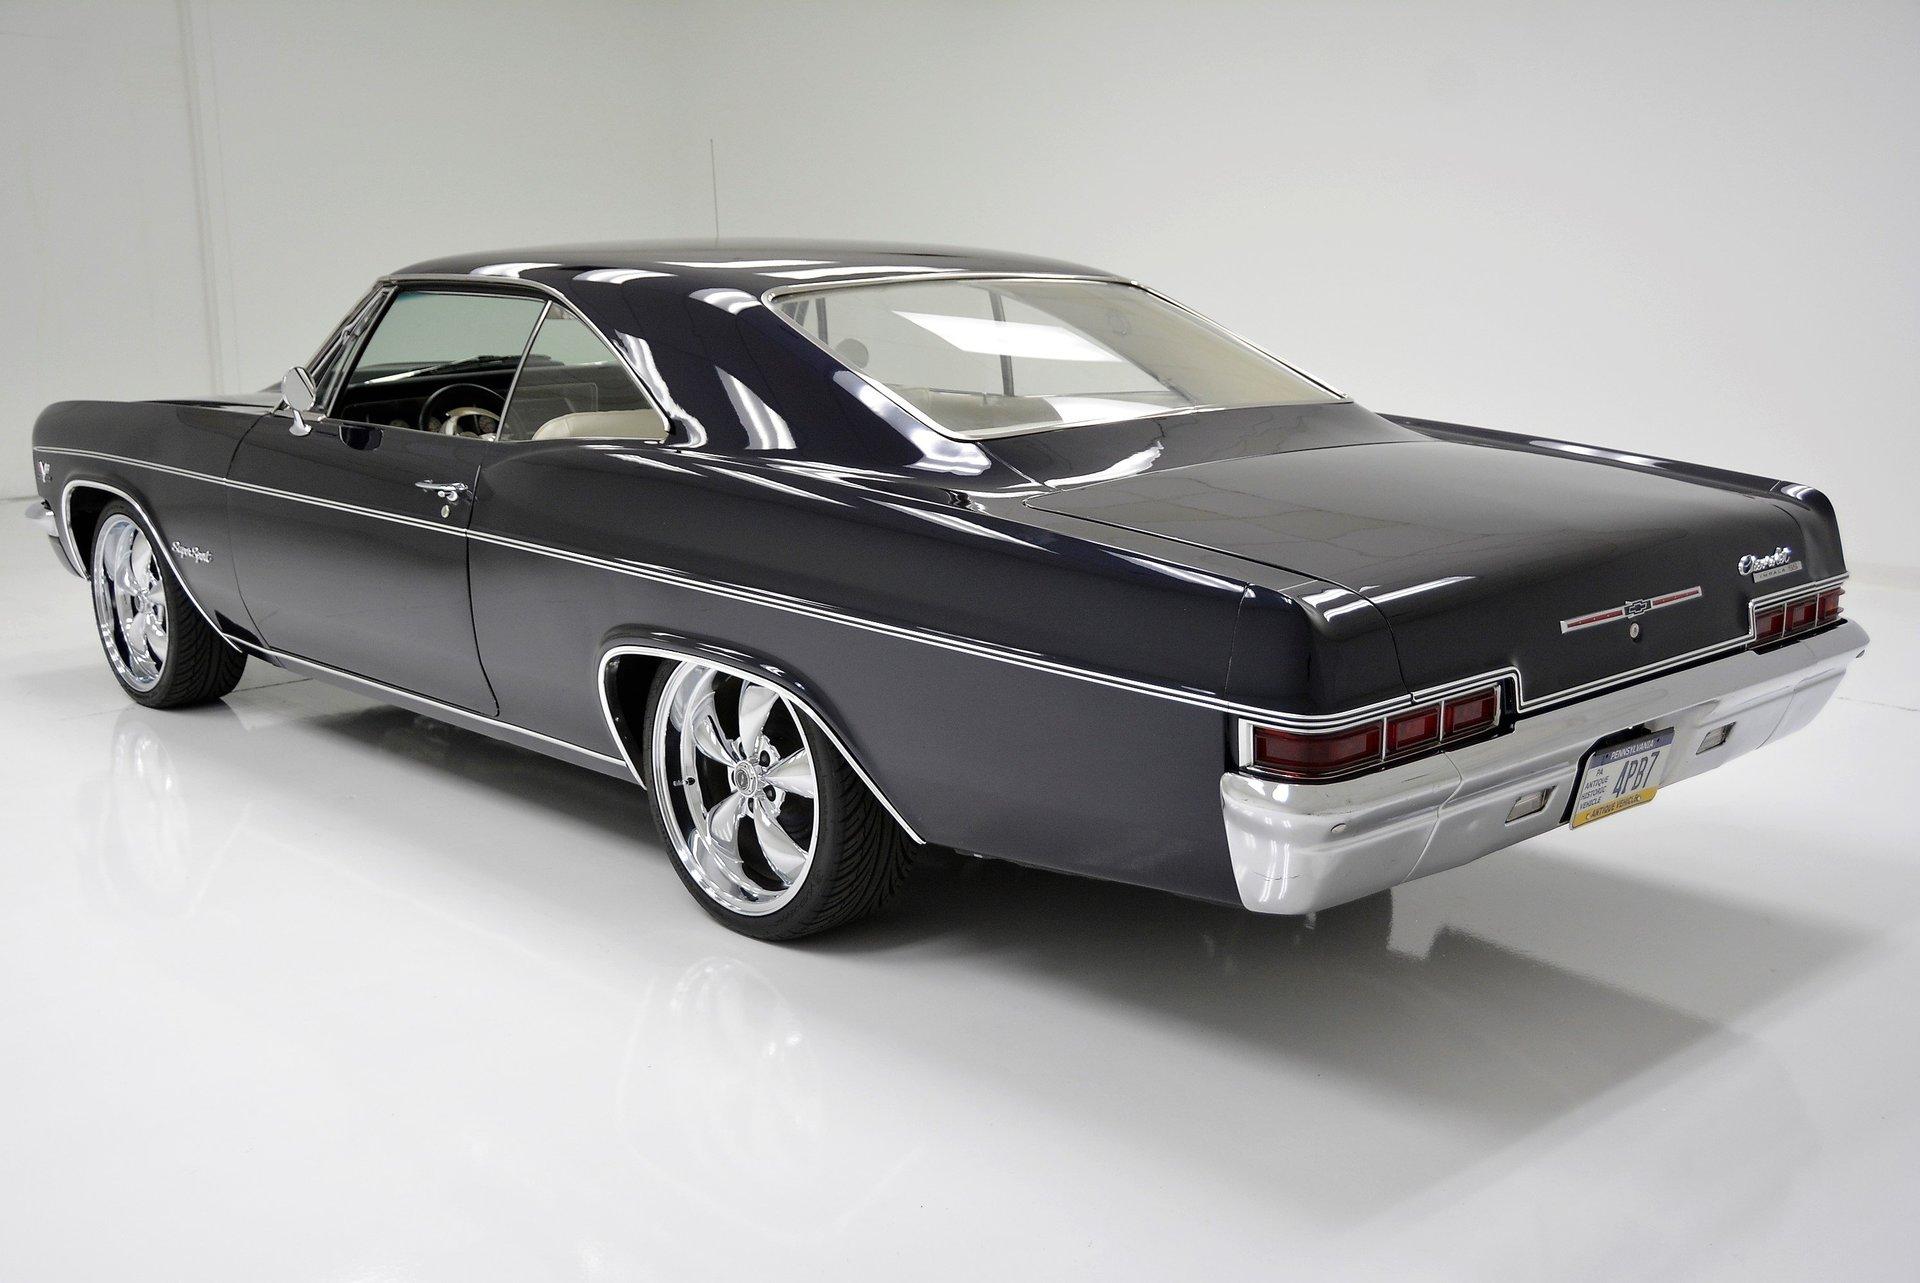 1966 Chevrolet Impala Ss Classic Auto Mall Chevy Suspension